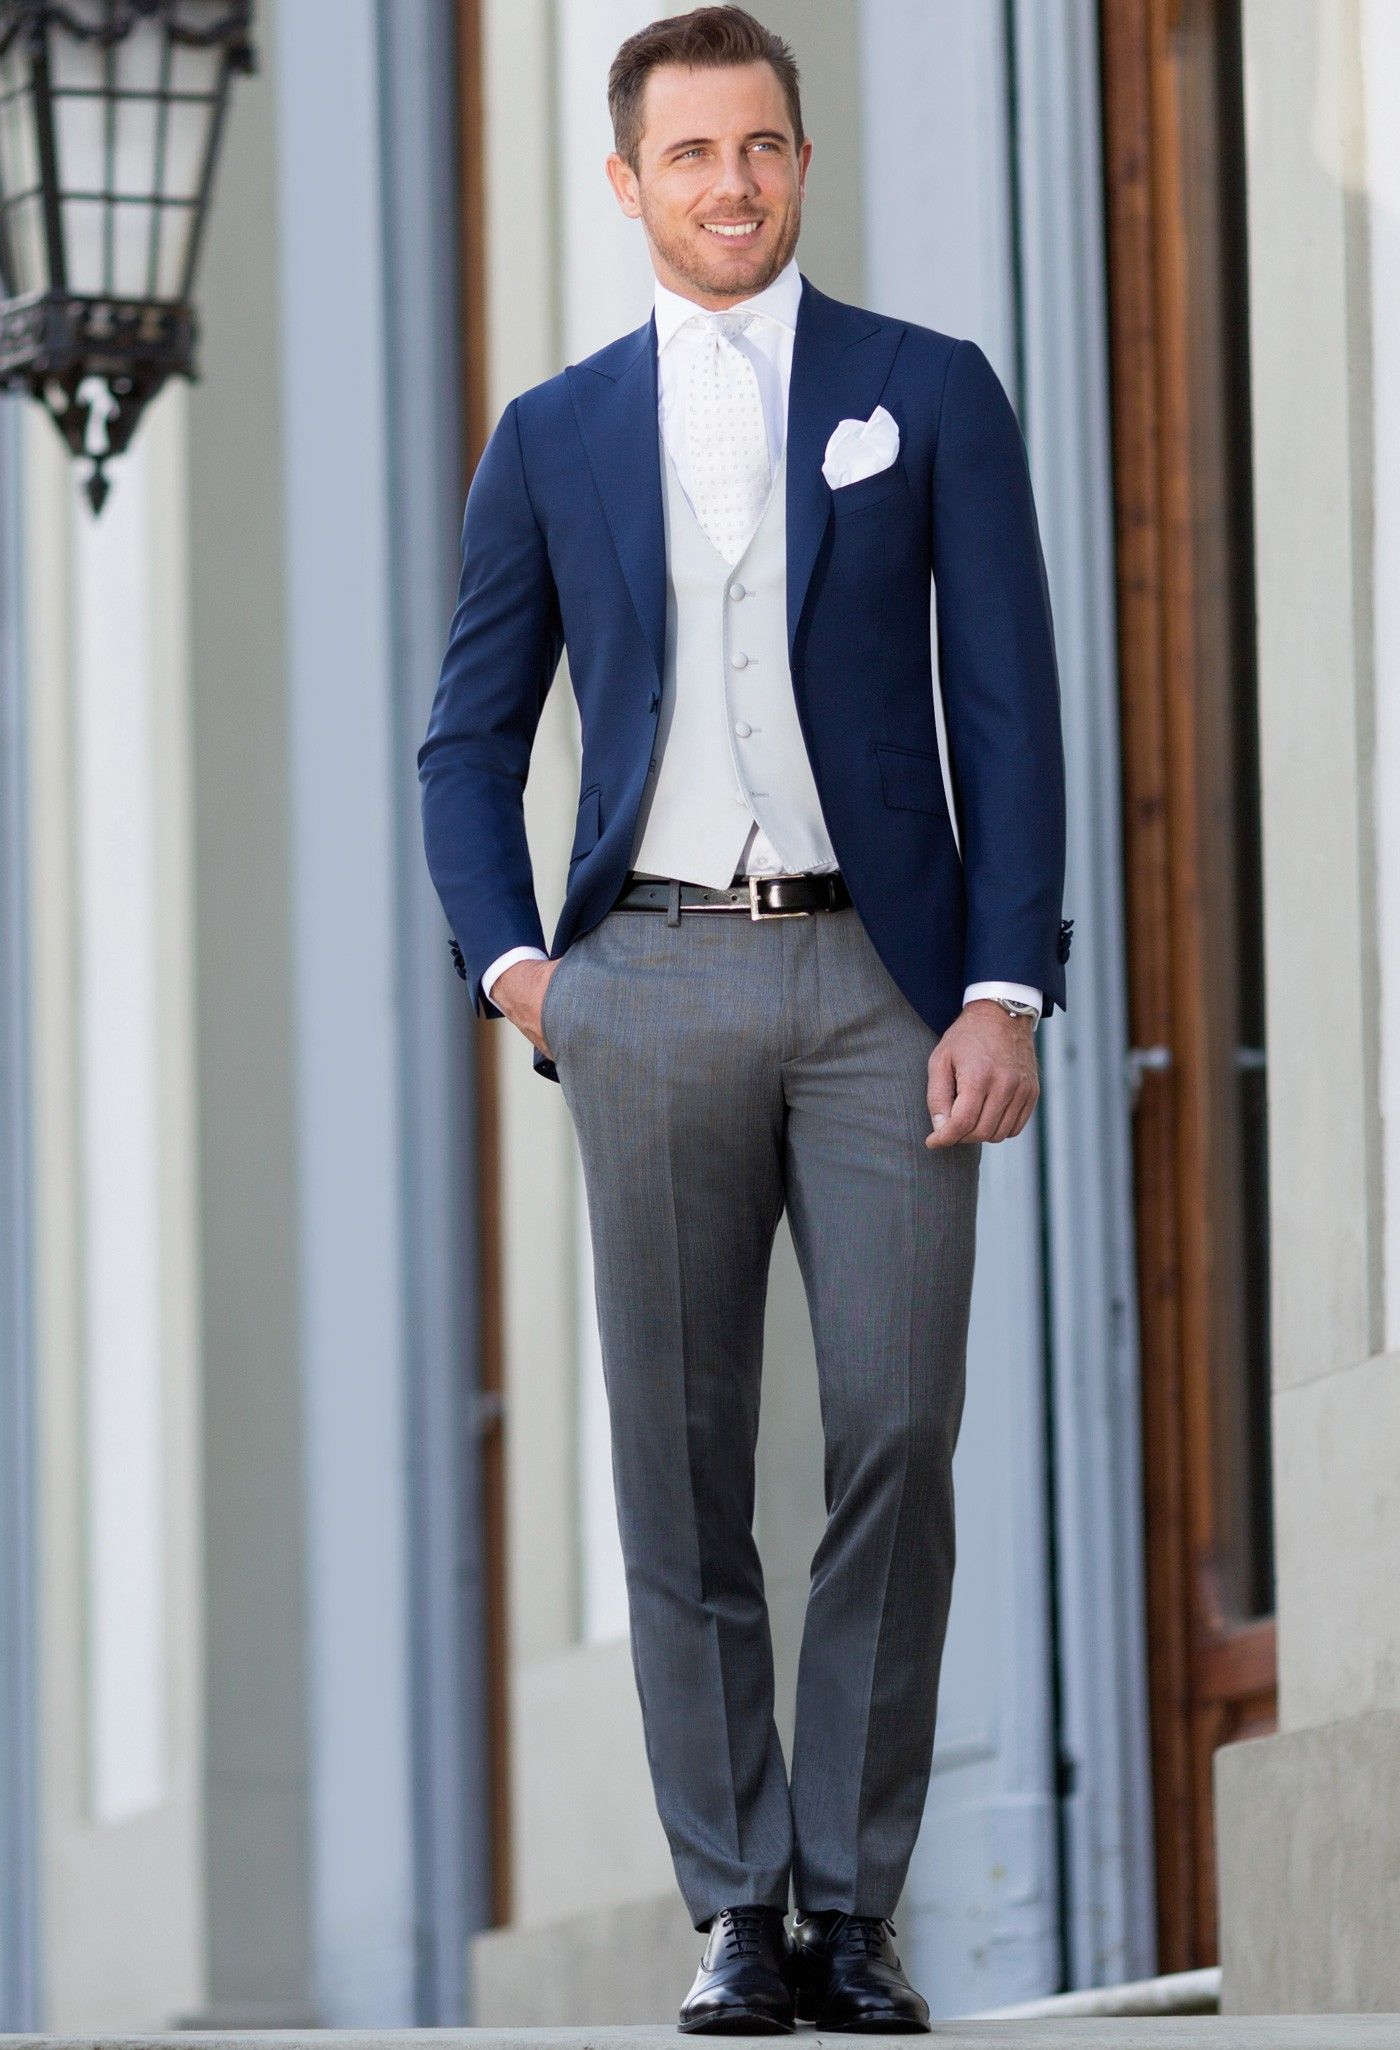 Blue Half Morning Suit | Tuxedo | Pinterest | Morning suits ...